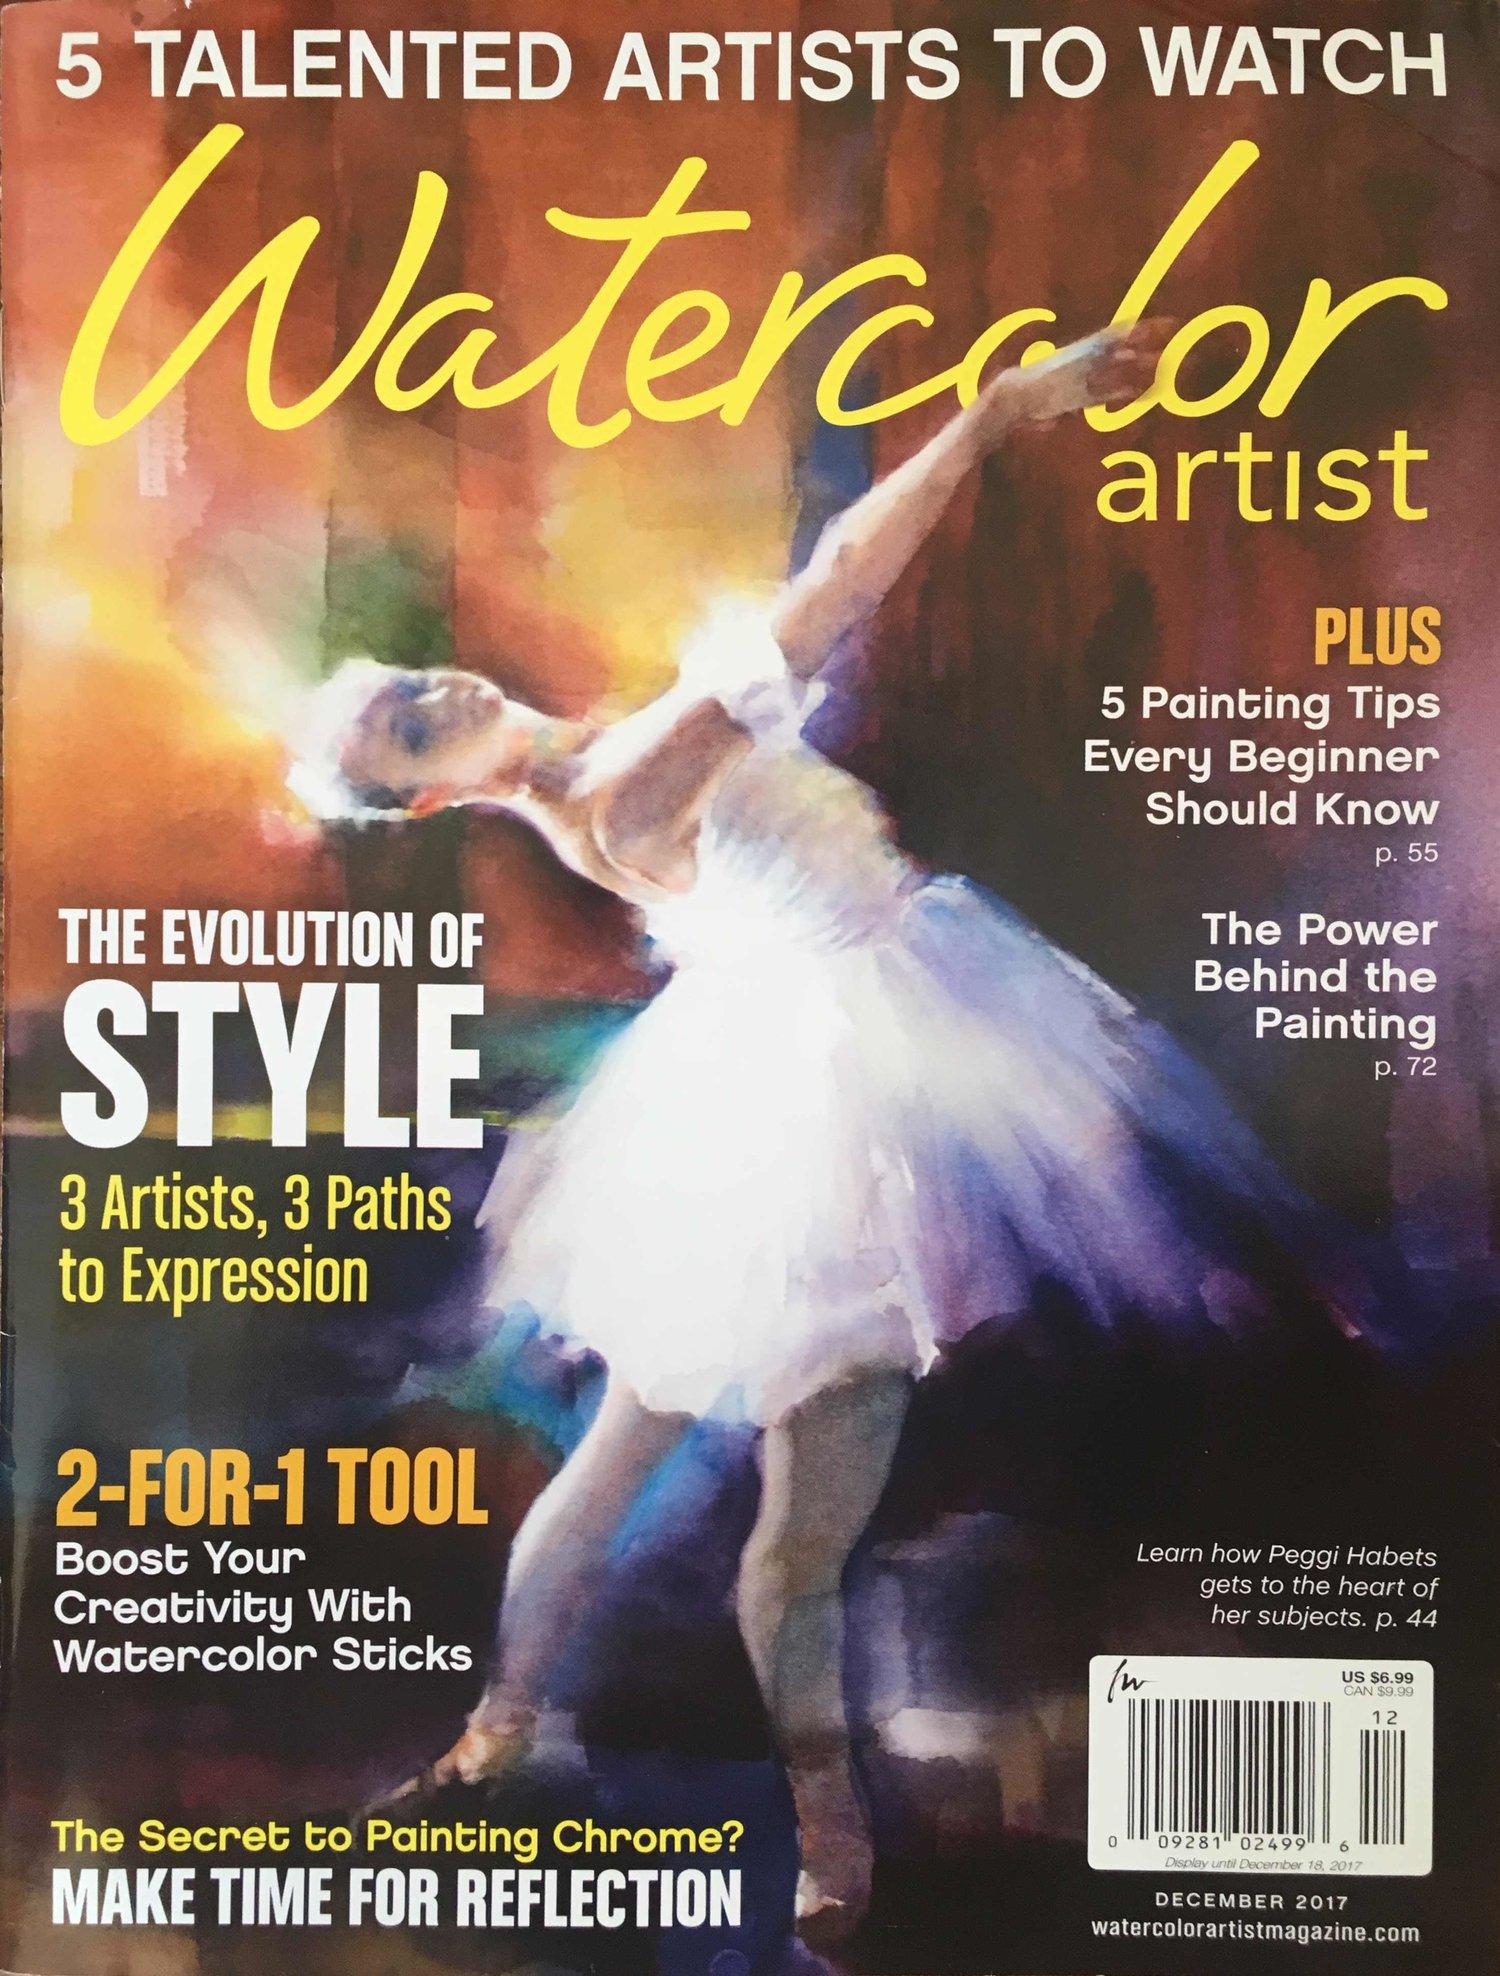 WatercolorArtistCover.jpg